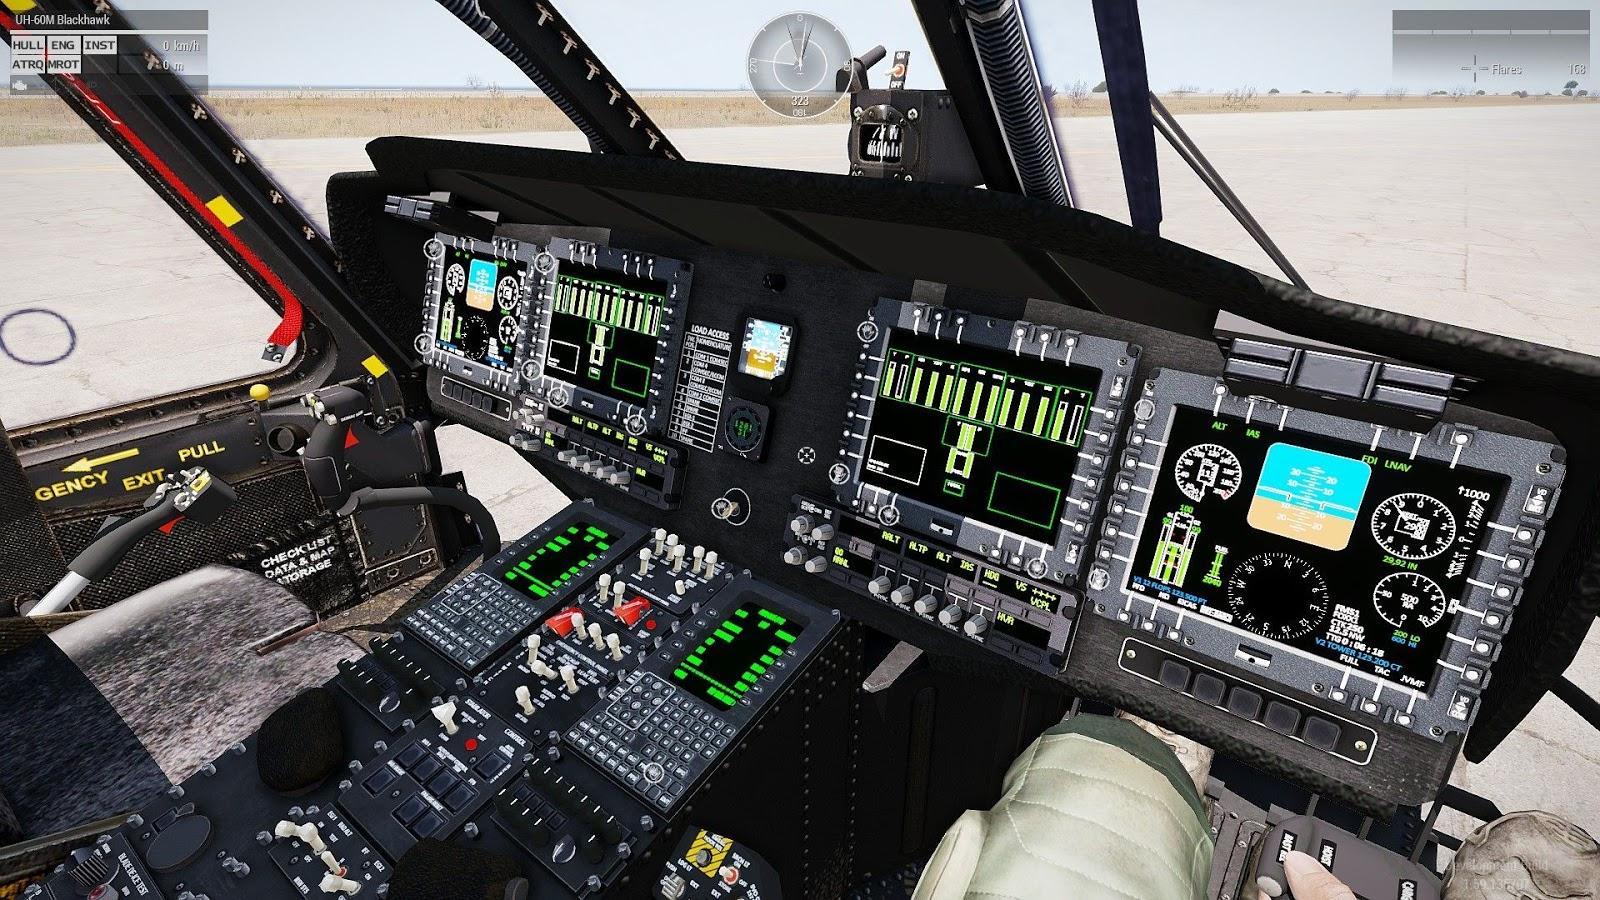 arma 3 blackhawk with Arma3 Yura Uh60m Blackhawk Mod Wip1 on 400201 New Ruger Gp 100 22lr Print moreover Mil Mi 24p Hind Vvs Russian Air Force additionally Taurus Model 44 moreover File McMillan CS5 SAS as well Watch.